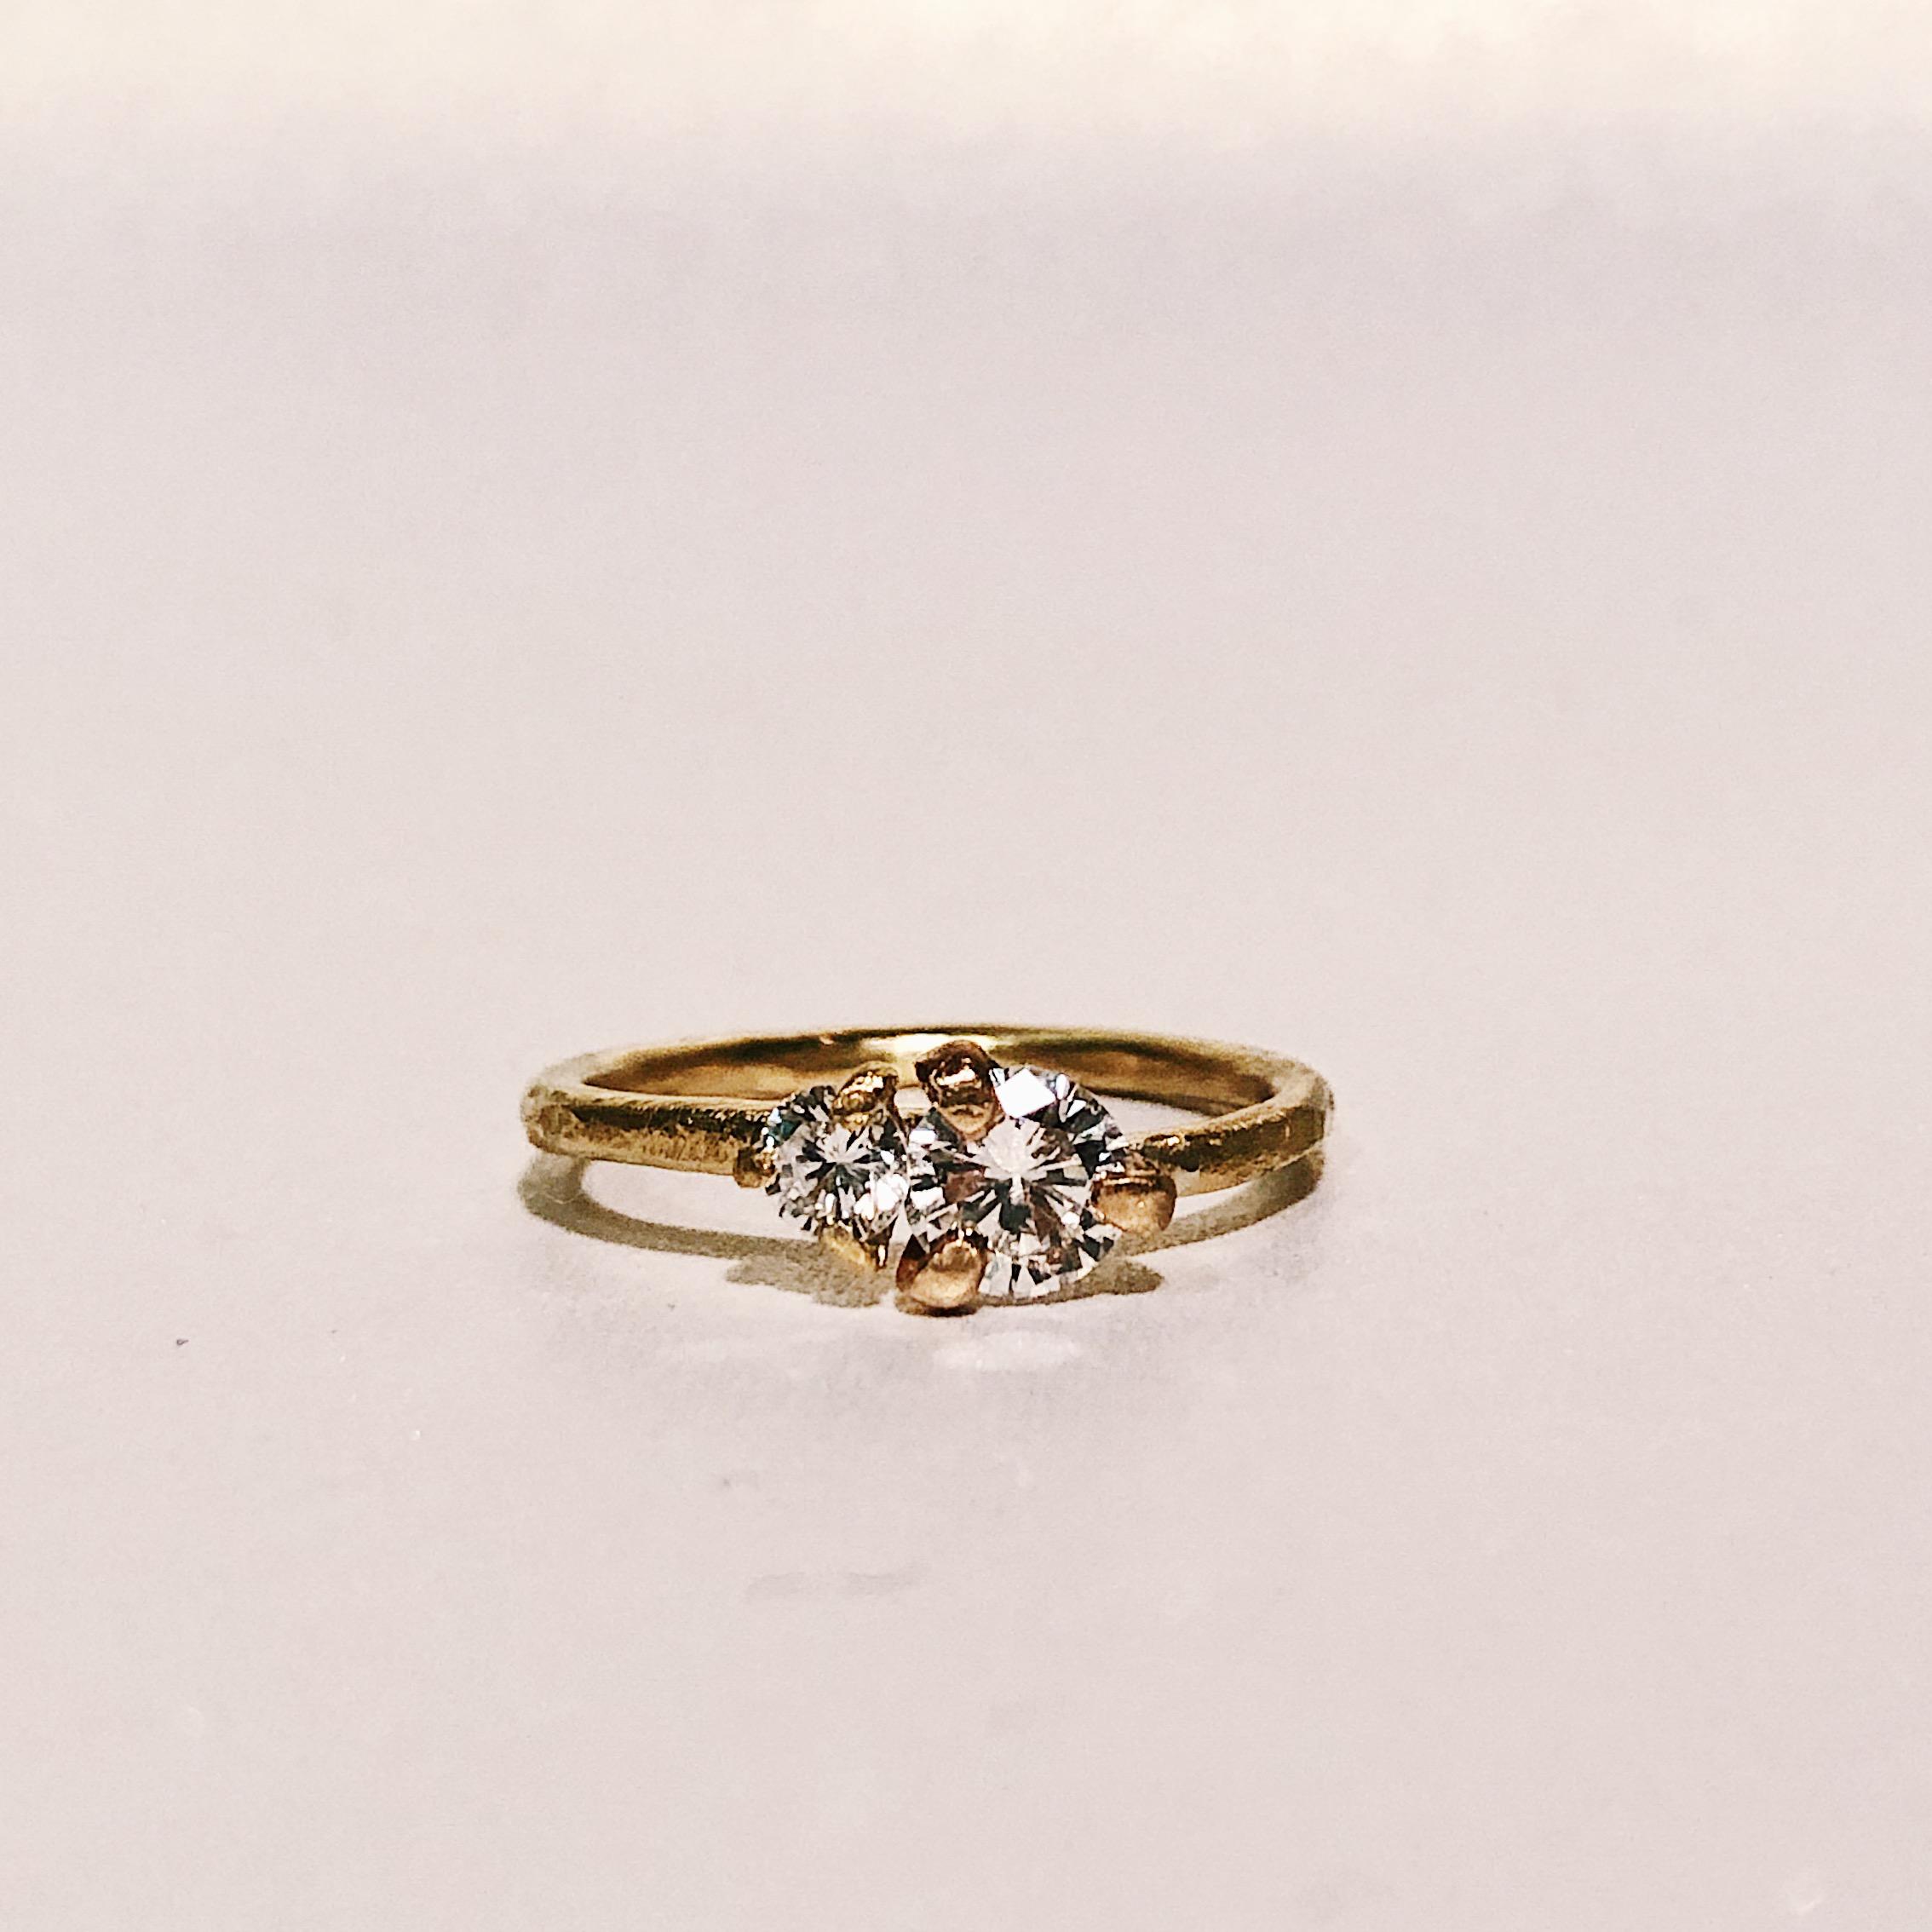 ACF Jewelry